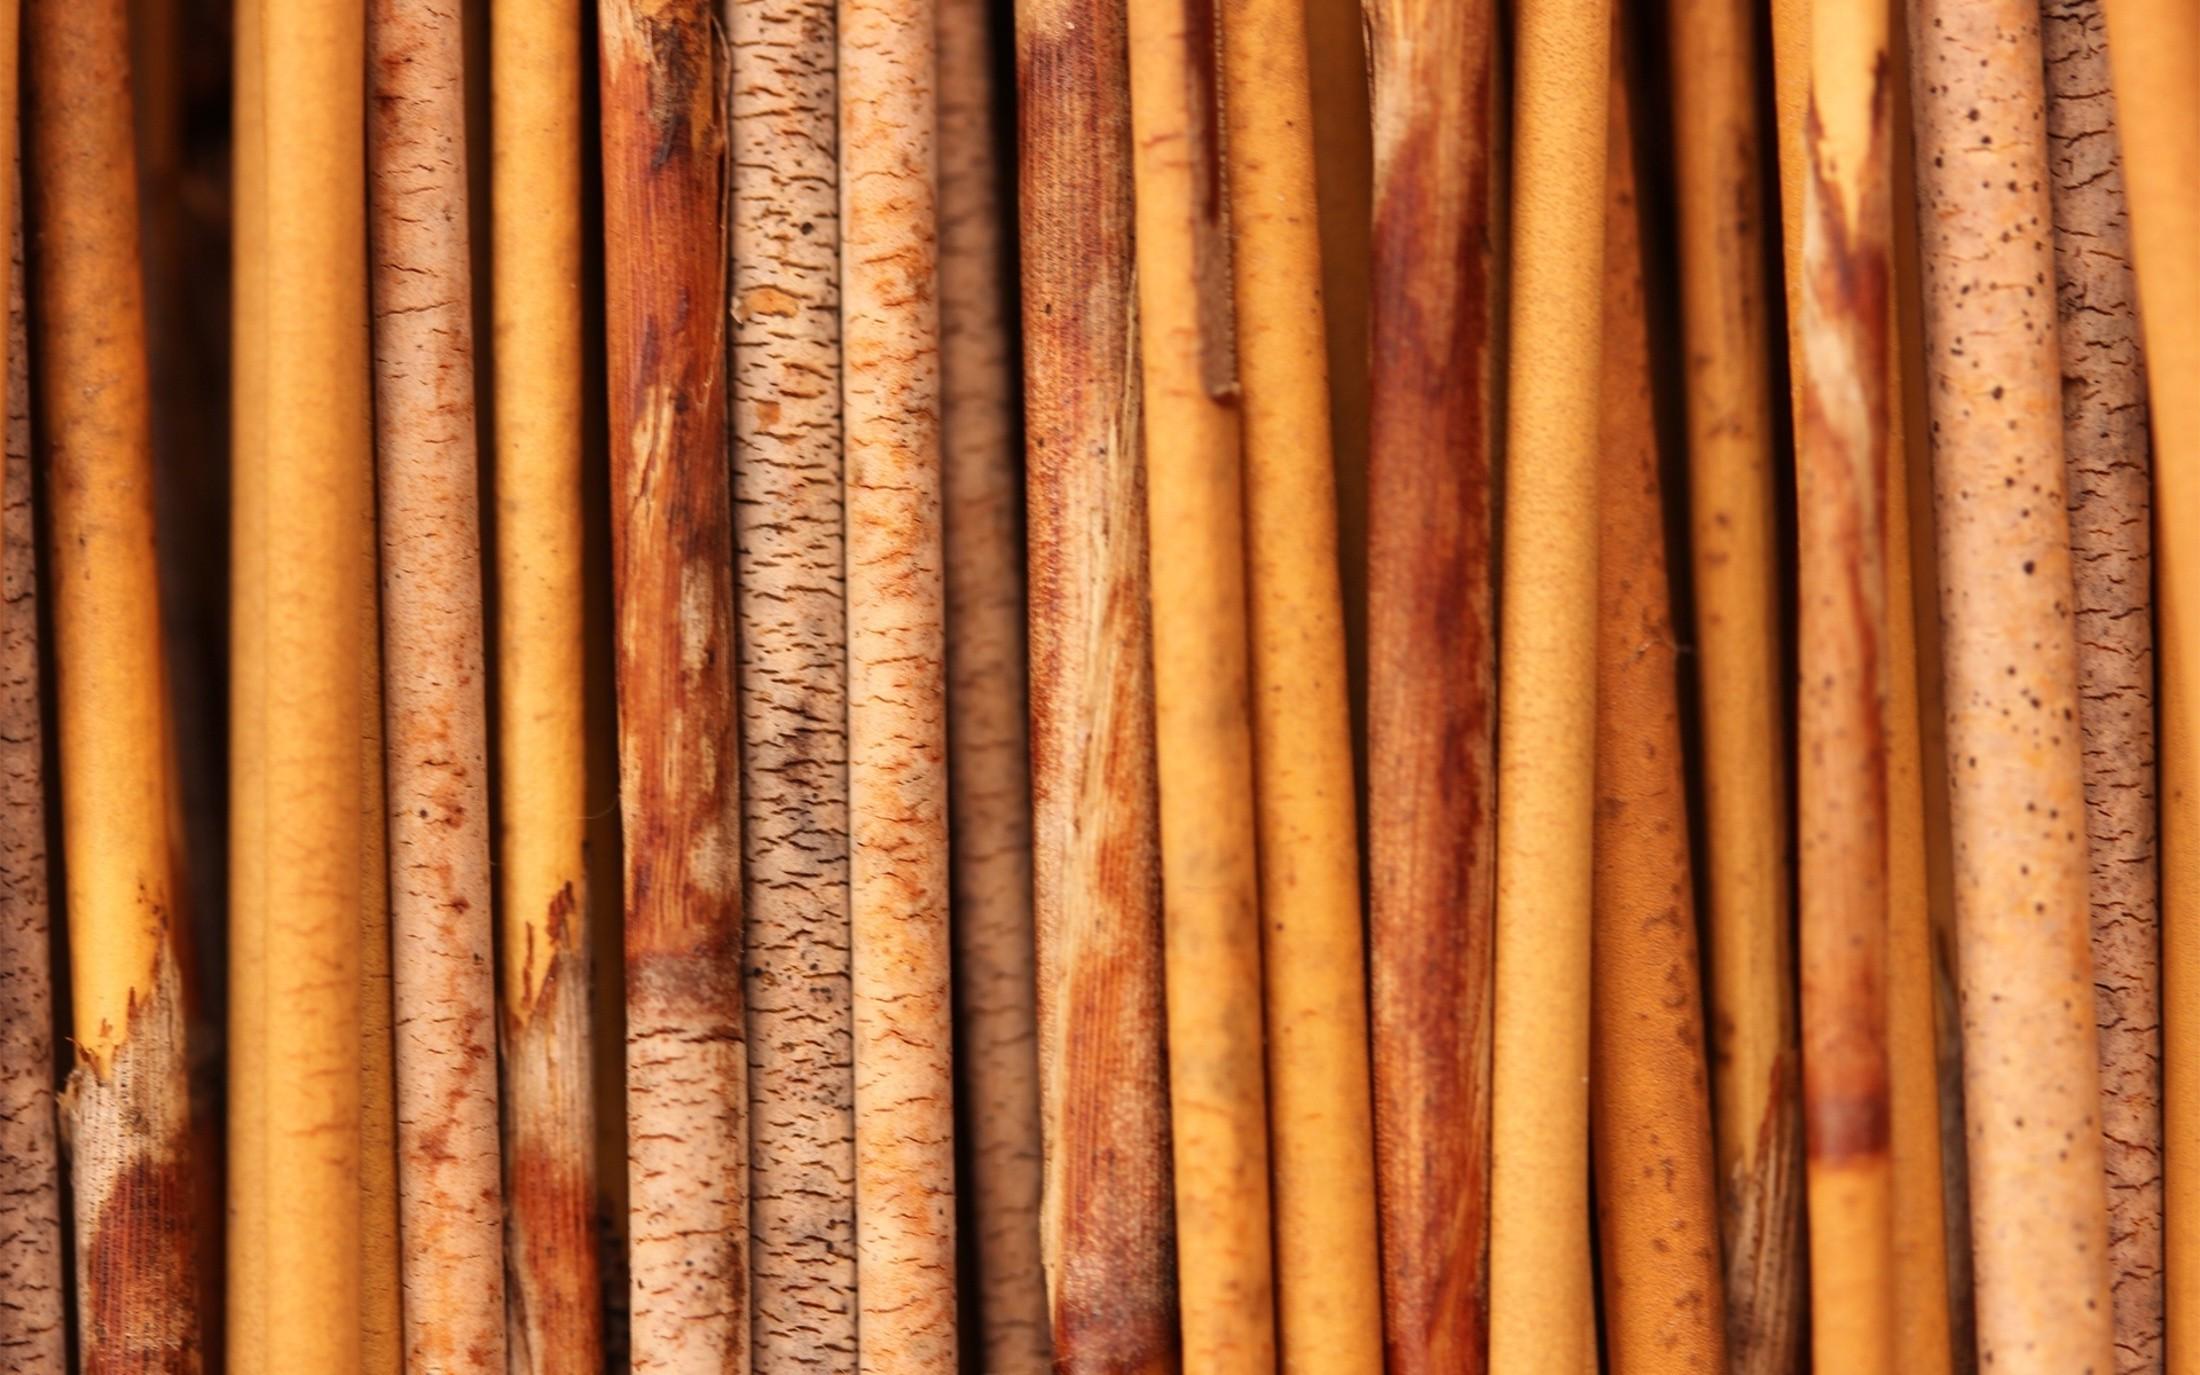 hintergrundbilder natur holz muster textur innenarchitektur bambus material hartholz. Black Bedroom Furniture Sets. Home Design Ideas